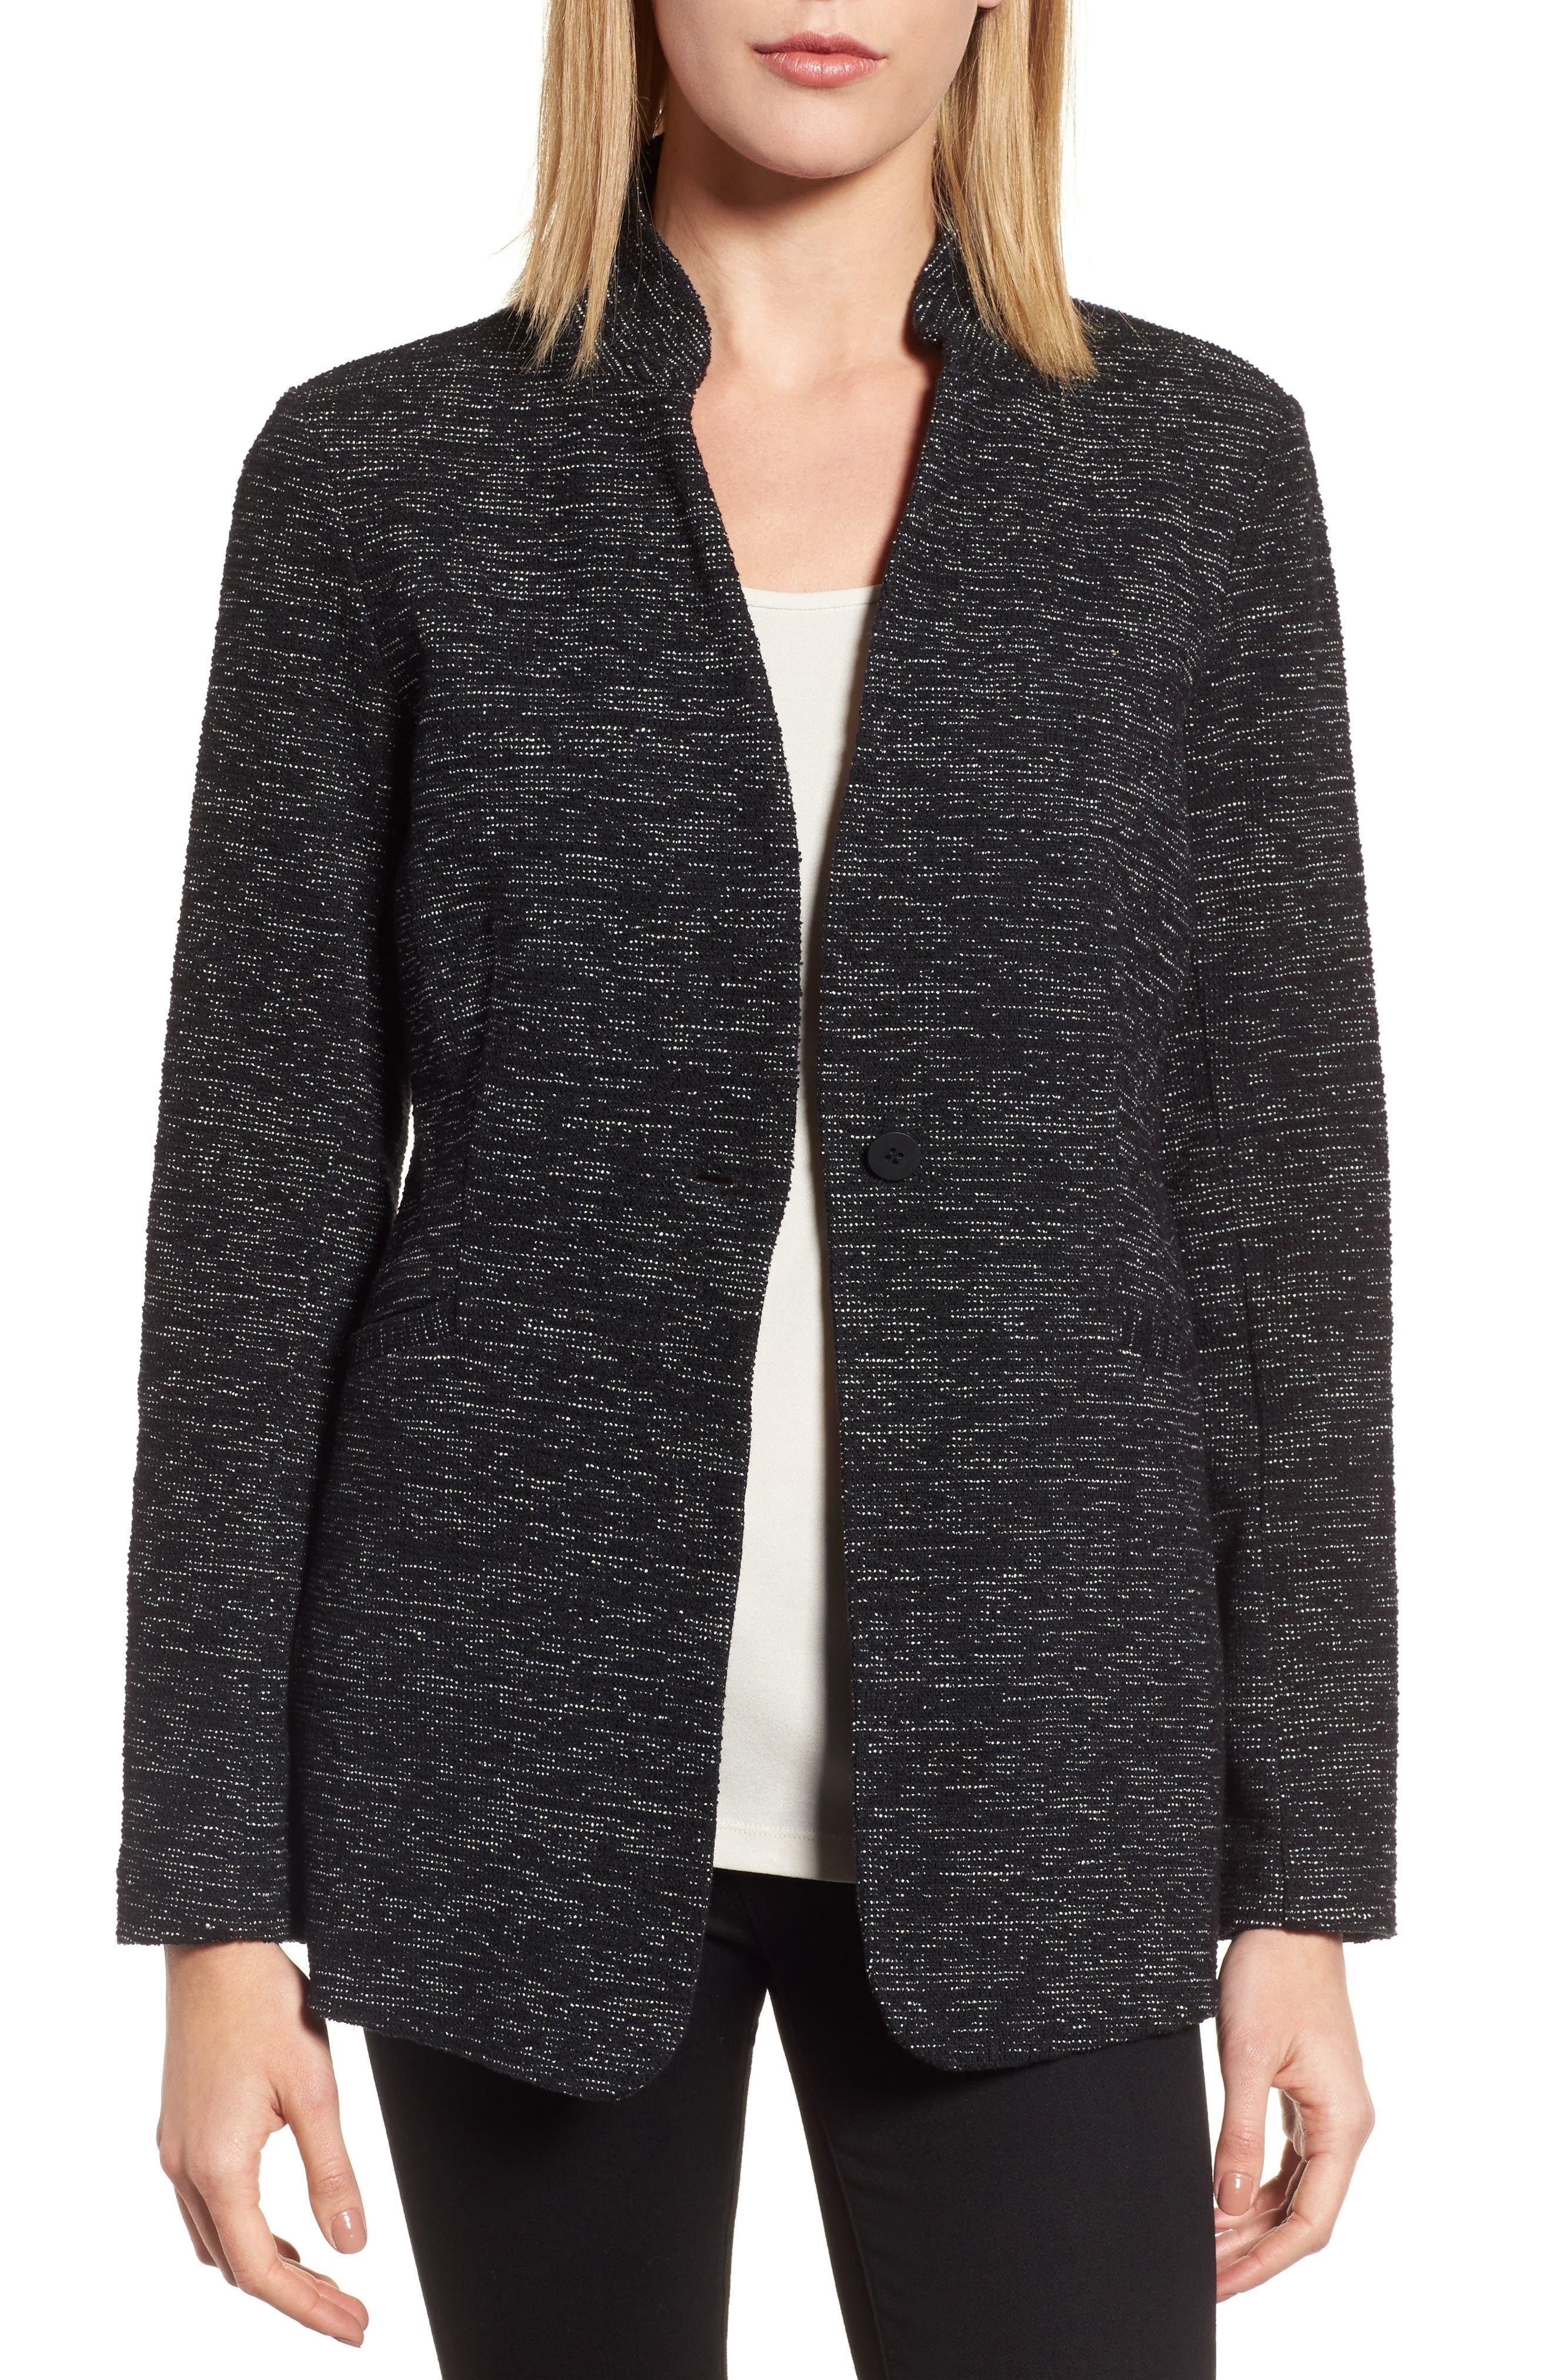 Organic Cotton Blend Tweed Jacket,                             Main thumbnail 1, color,